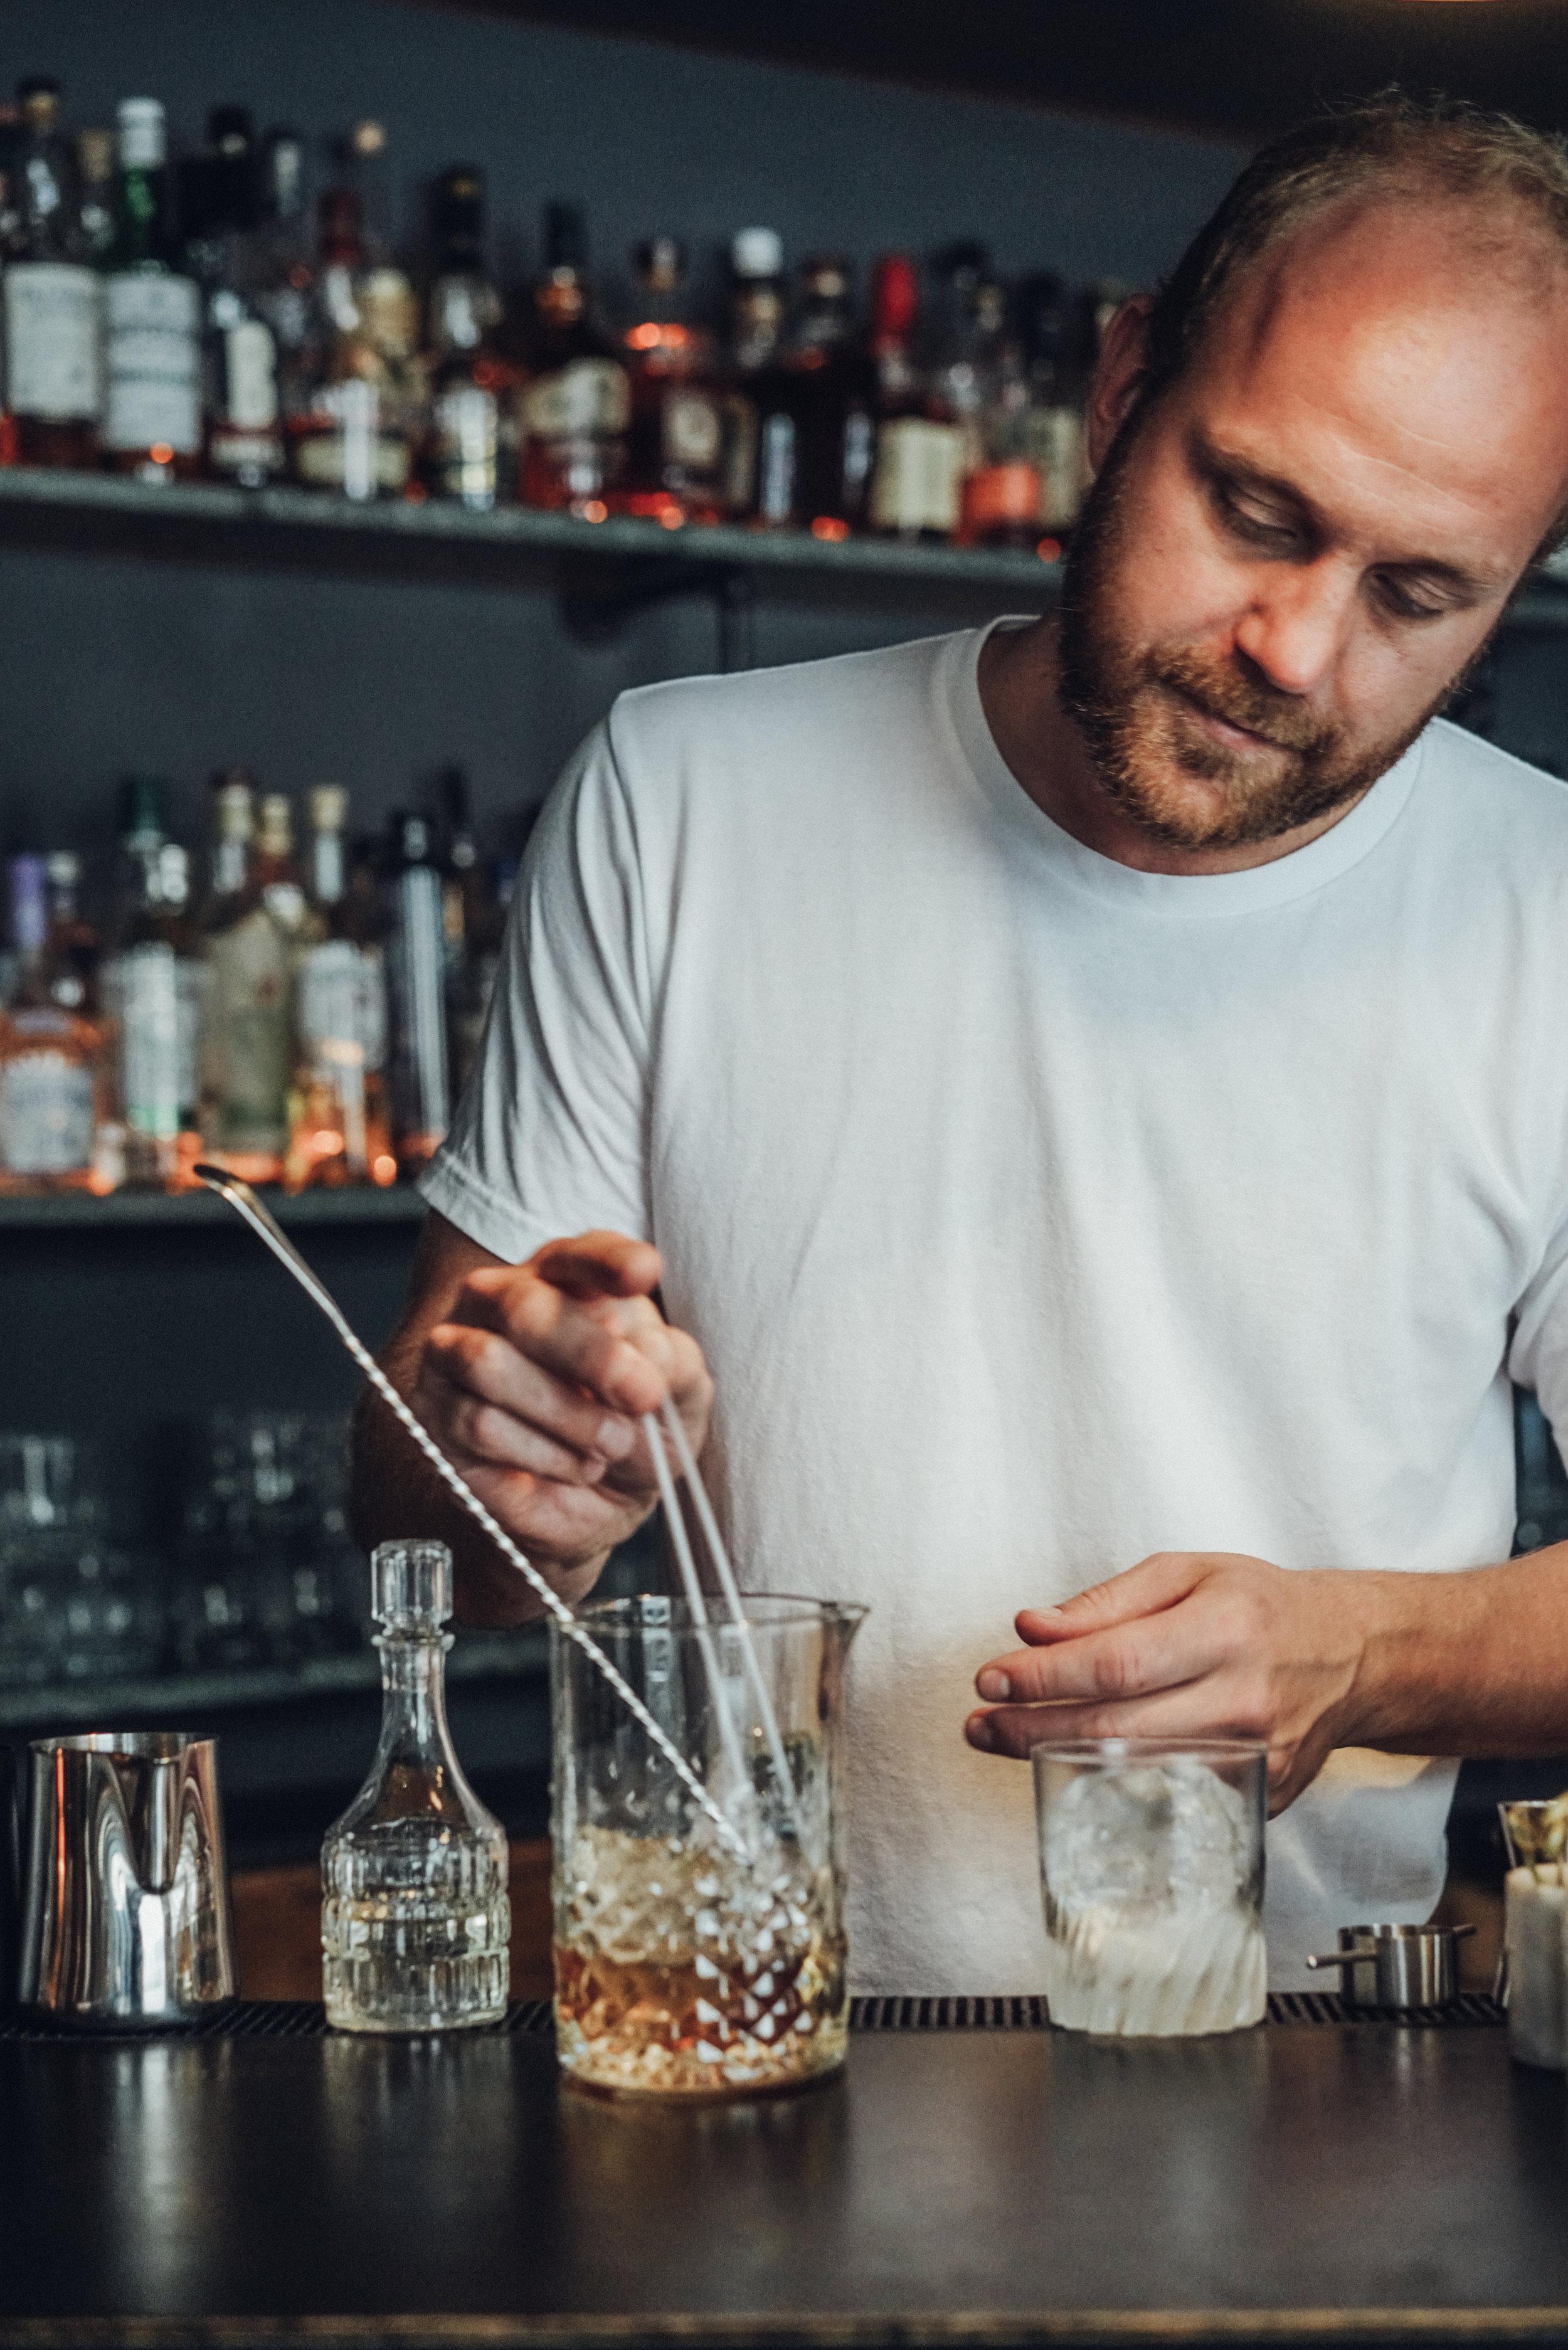 Kasper Riewe Henriksen making a cocktail step 4